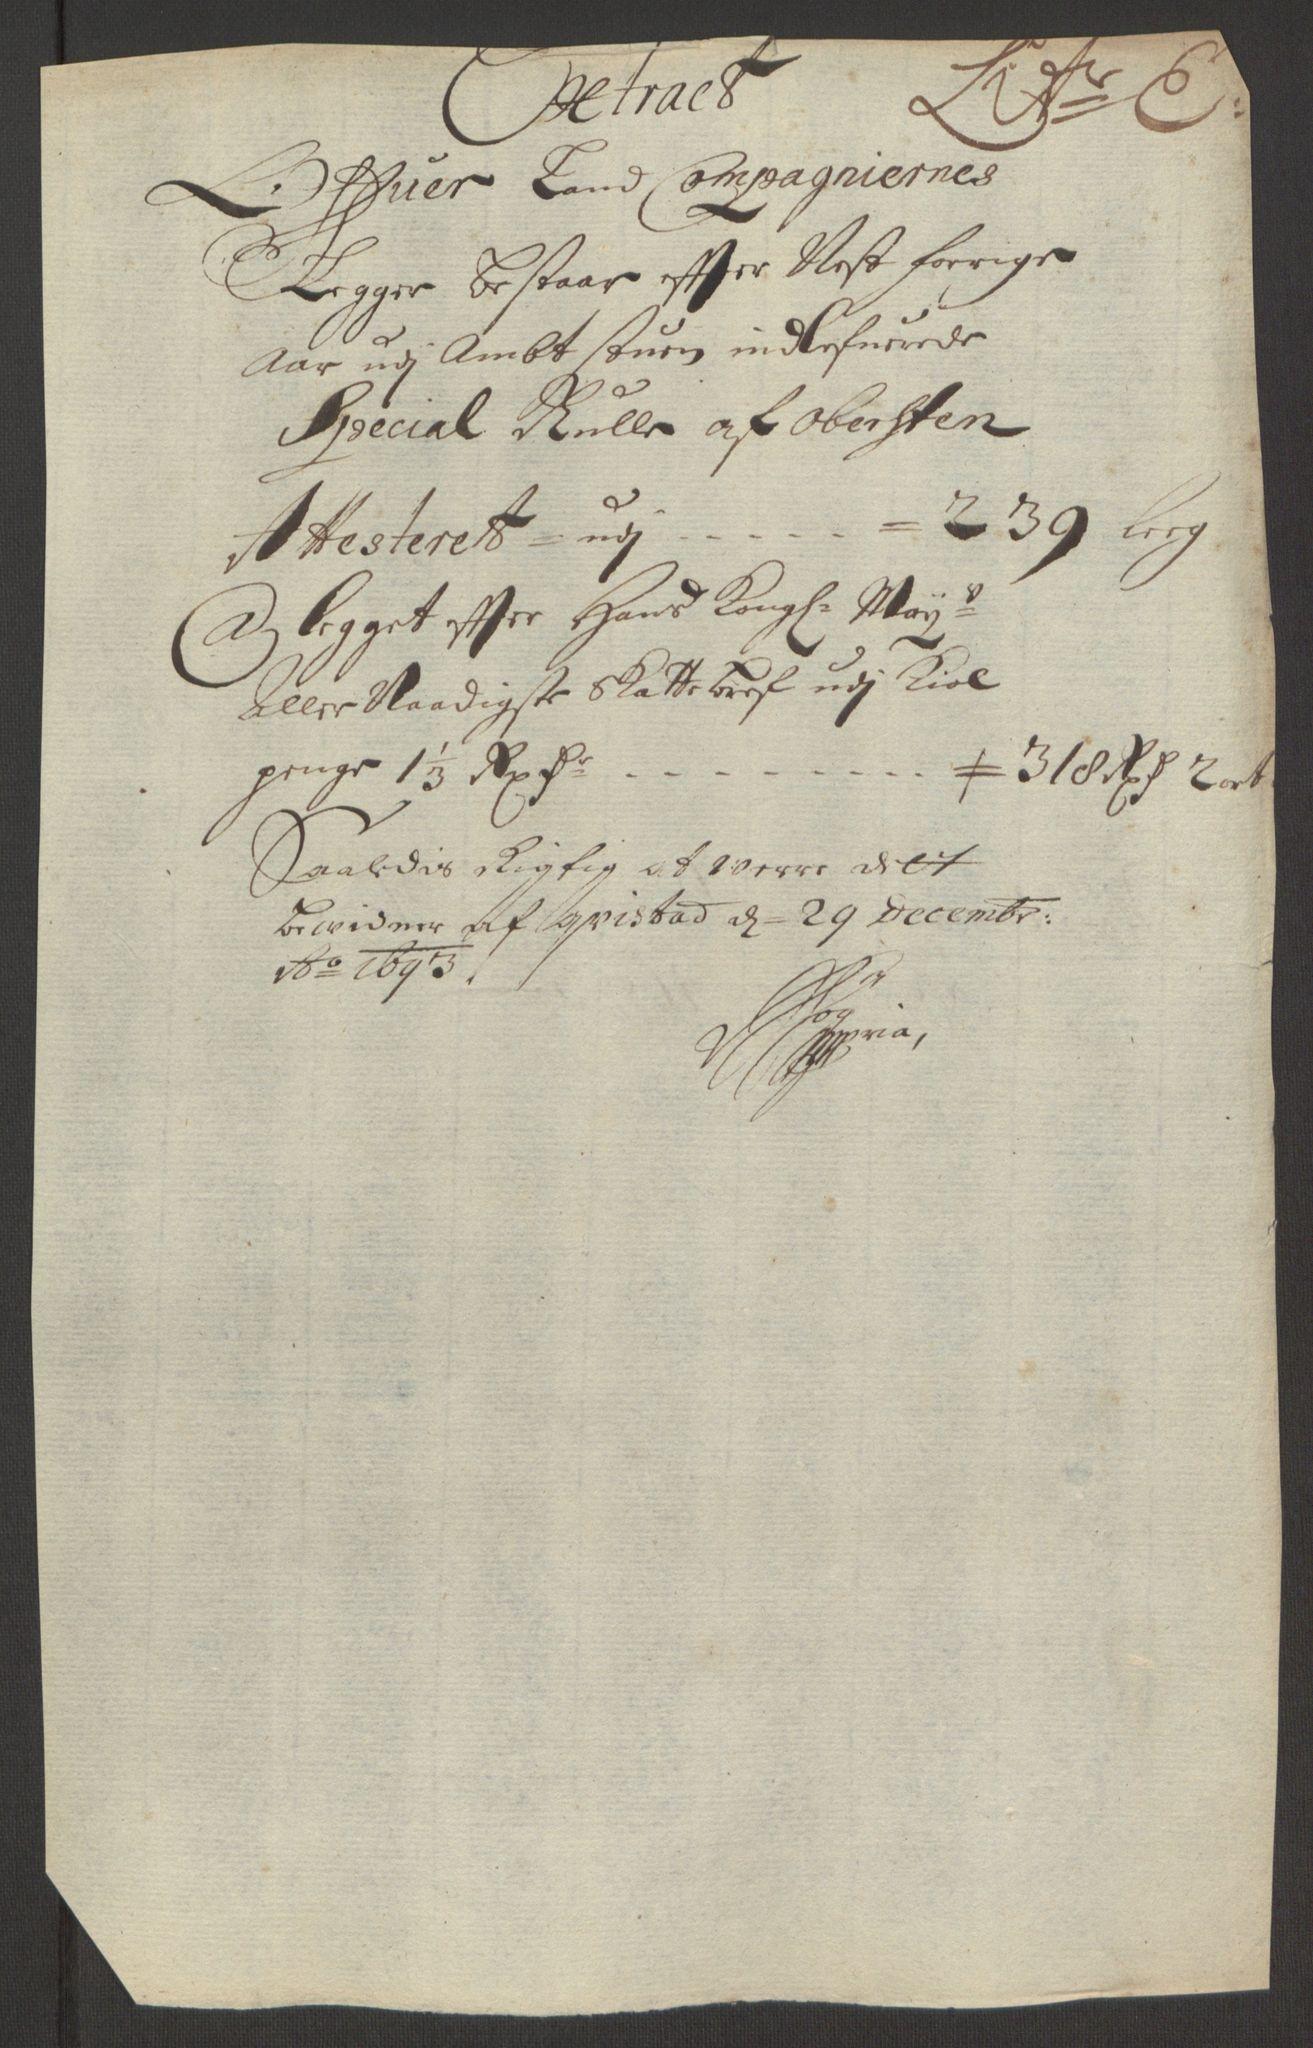 RA, Rentekammeret inntil 1814, Reviderte regnskaper, Fogderegnskap, R63/L4308: Fogderegnskap Inderøy, 1692-1694, s. 442